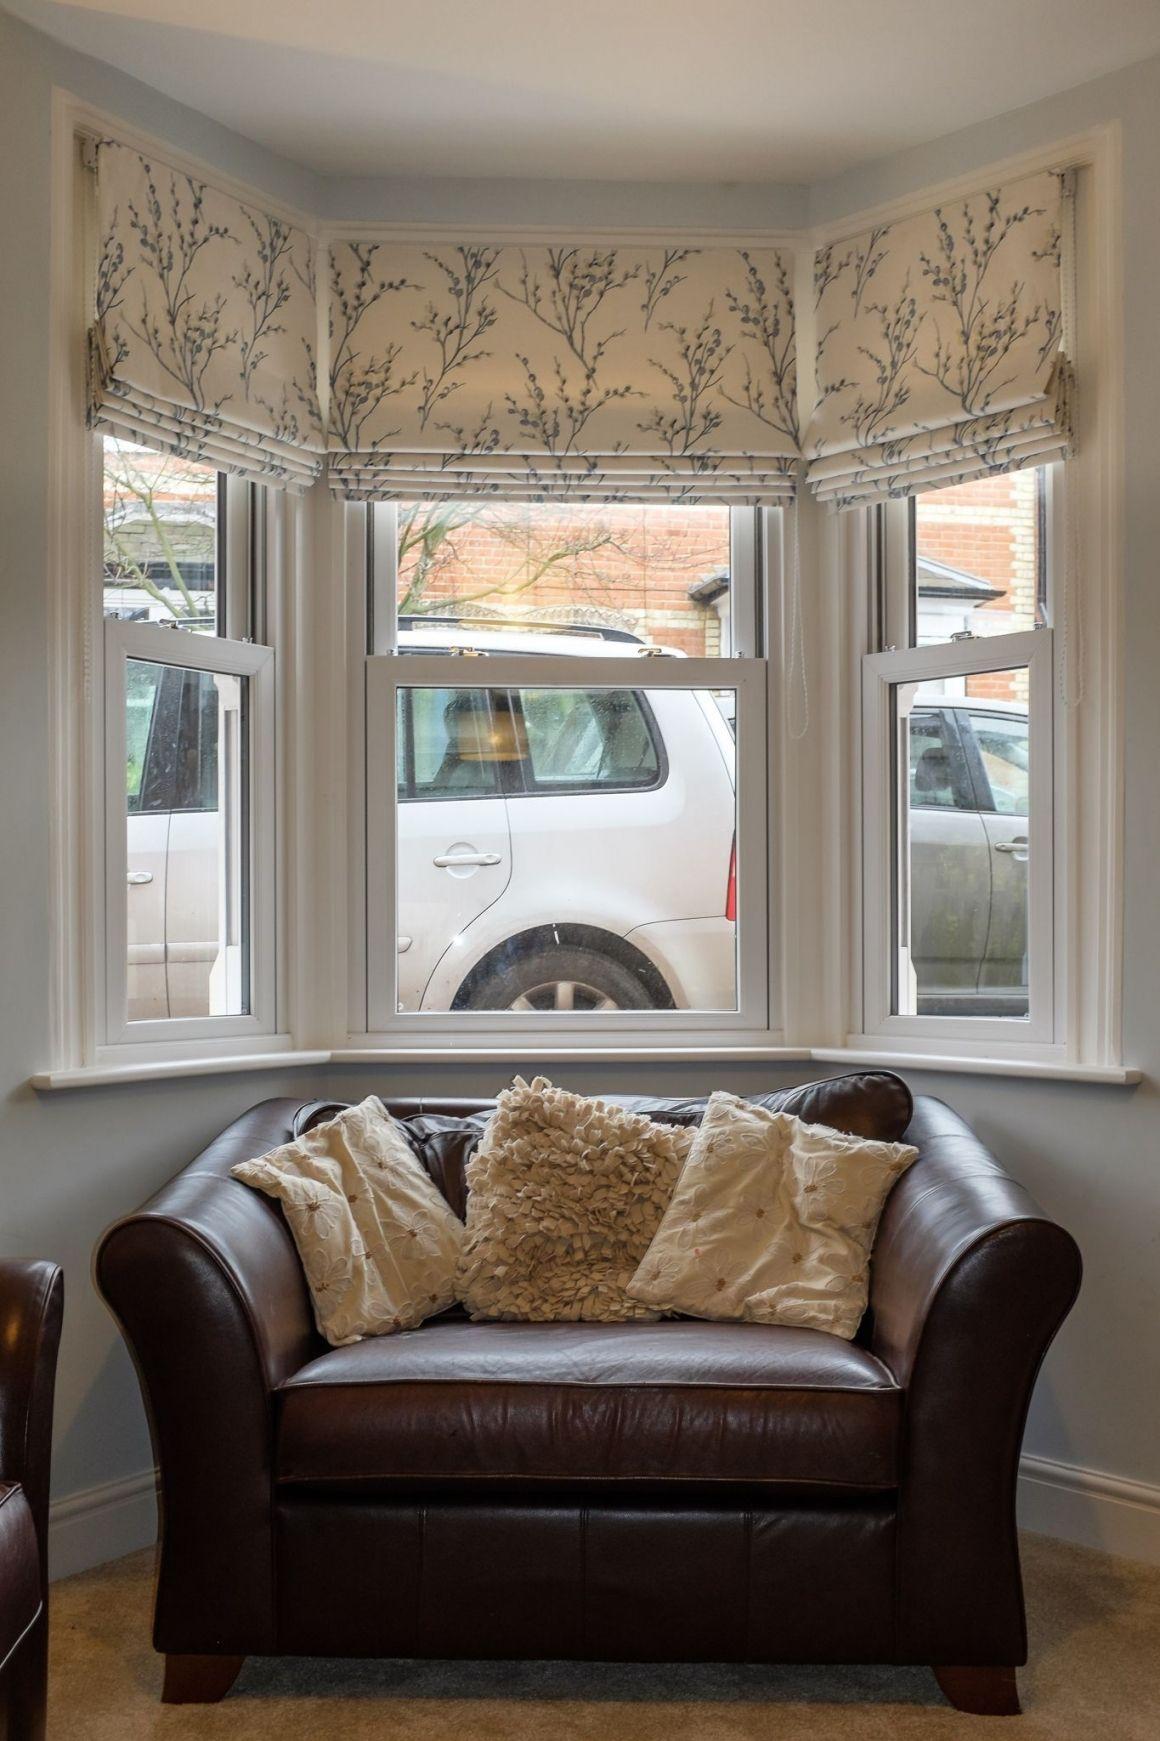 The 9 Perfect Bay Window Dressing Ideas Wc030ffgi Https Sherriematula Com The 9 Perf Bay Window Living Room Window Treatments Living Room Living Room Windows